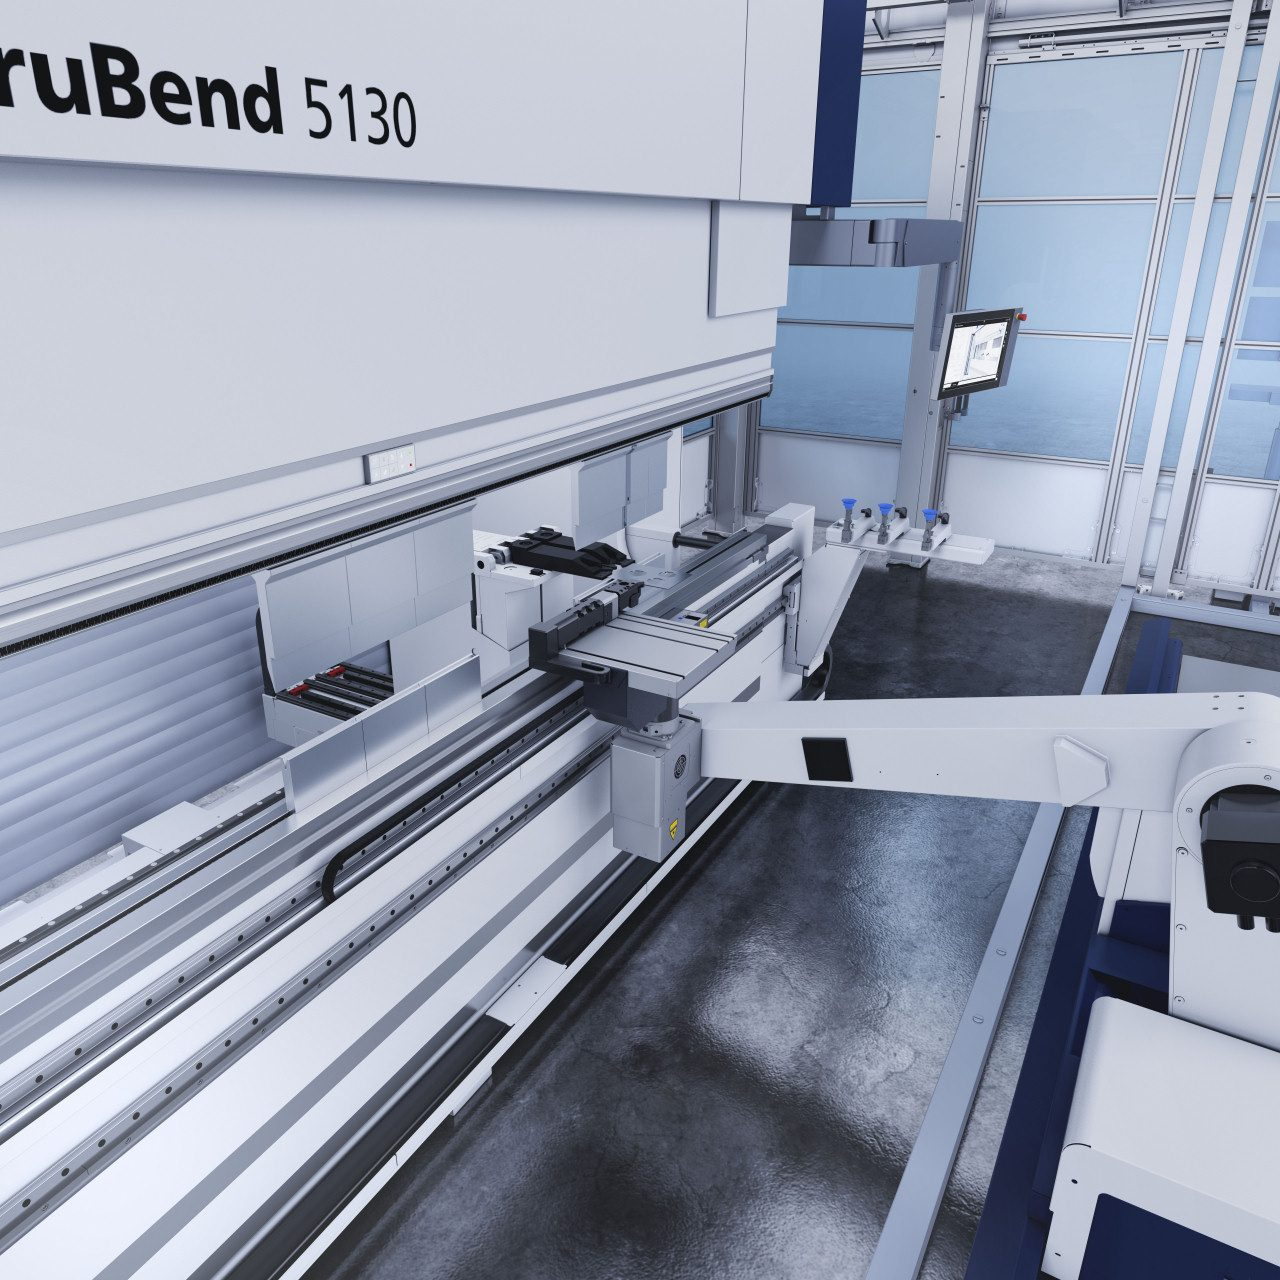 trubend-5130-03-02